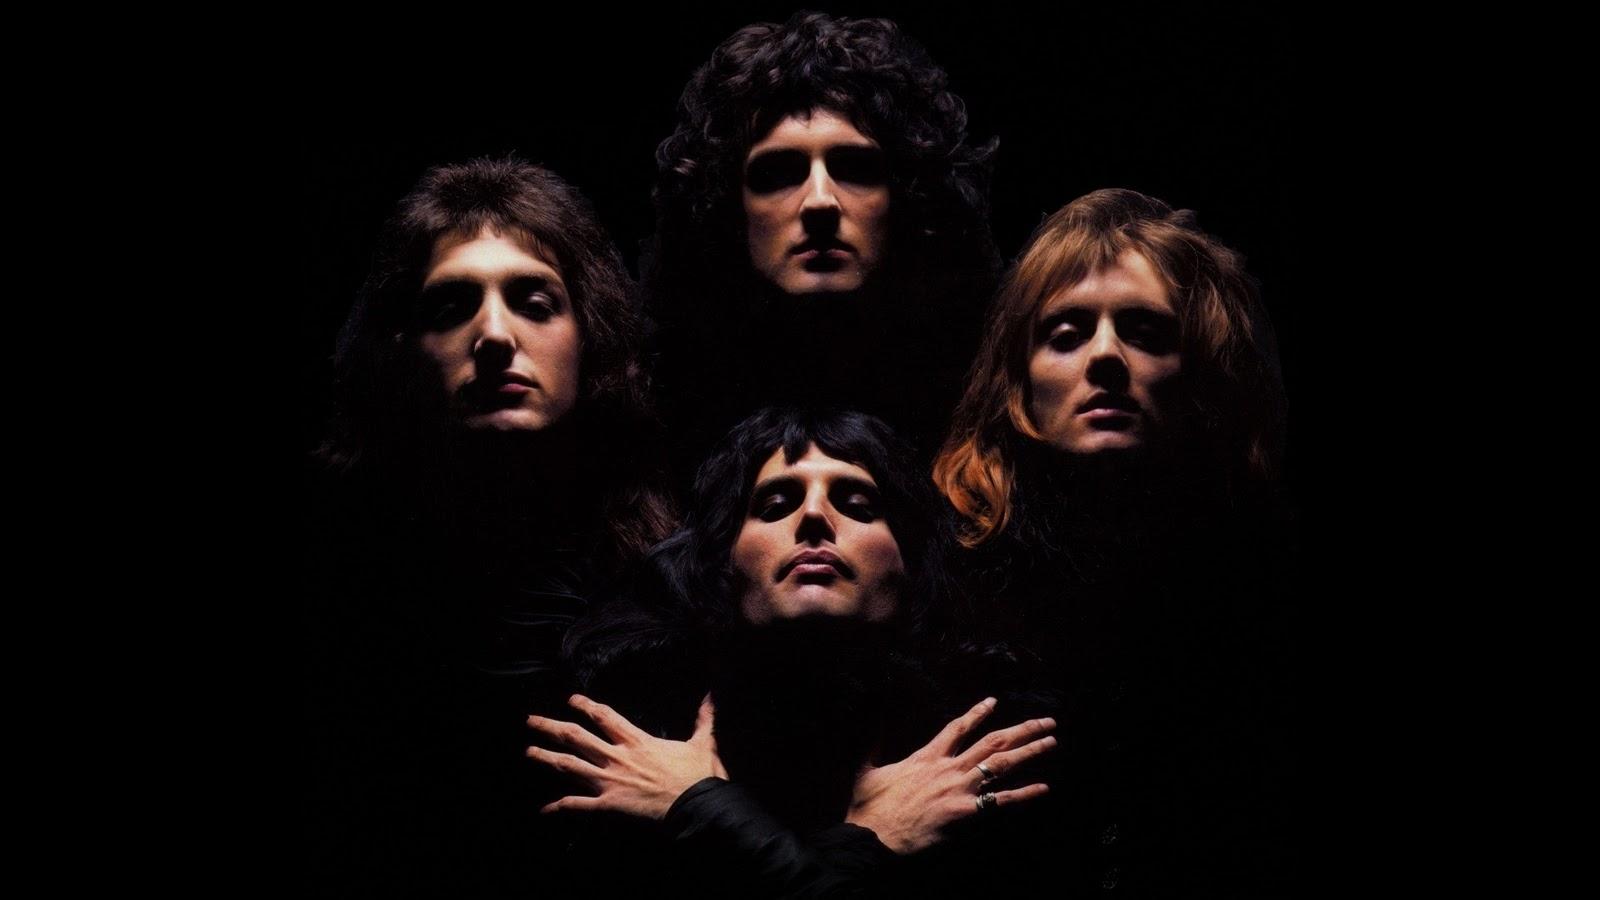 http://1.bp.blogspot.com/-ywKAQsQNwco/ToUTvcEvNHI/AAAAAAAAAPM/r7yWr75rfQI/s1600/Queen-Wallpaper-HD-bohemian-rhapsody-a-person.jpg